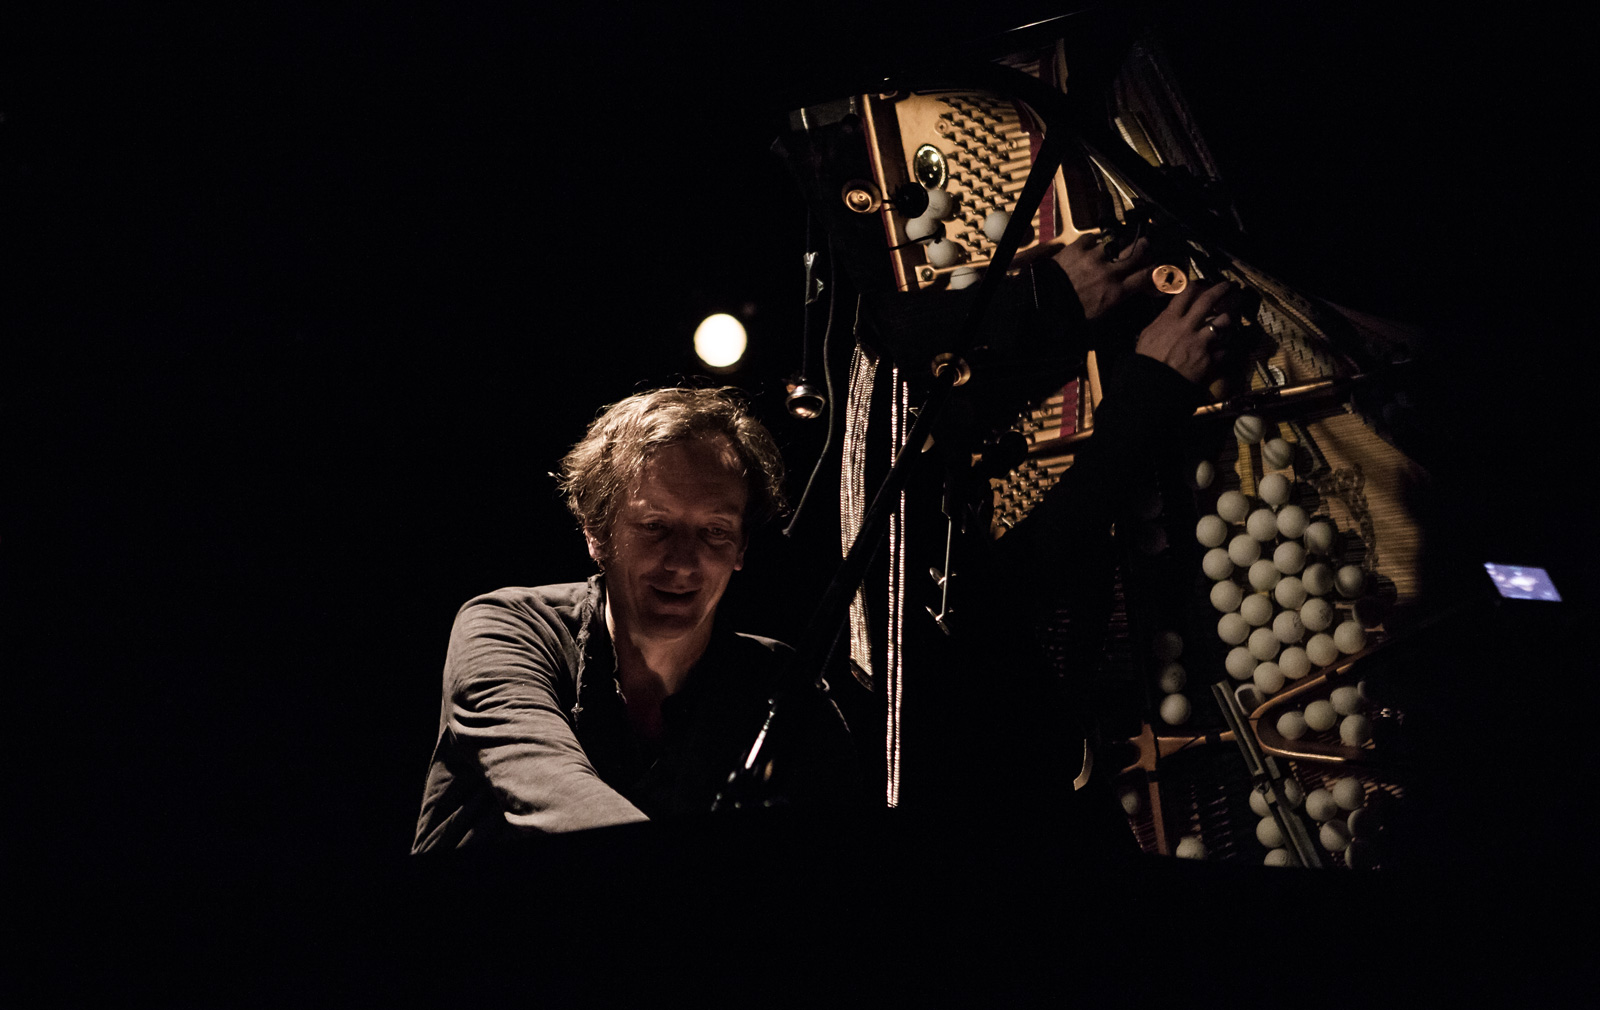 Hauschka-at-the-piano